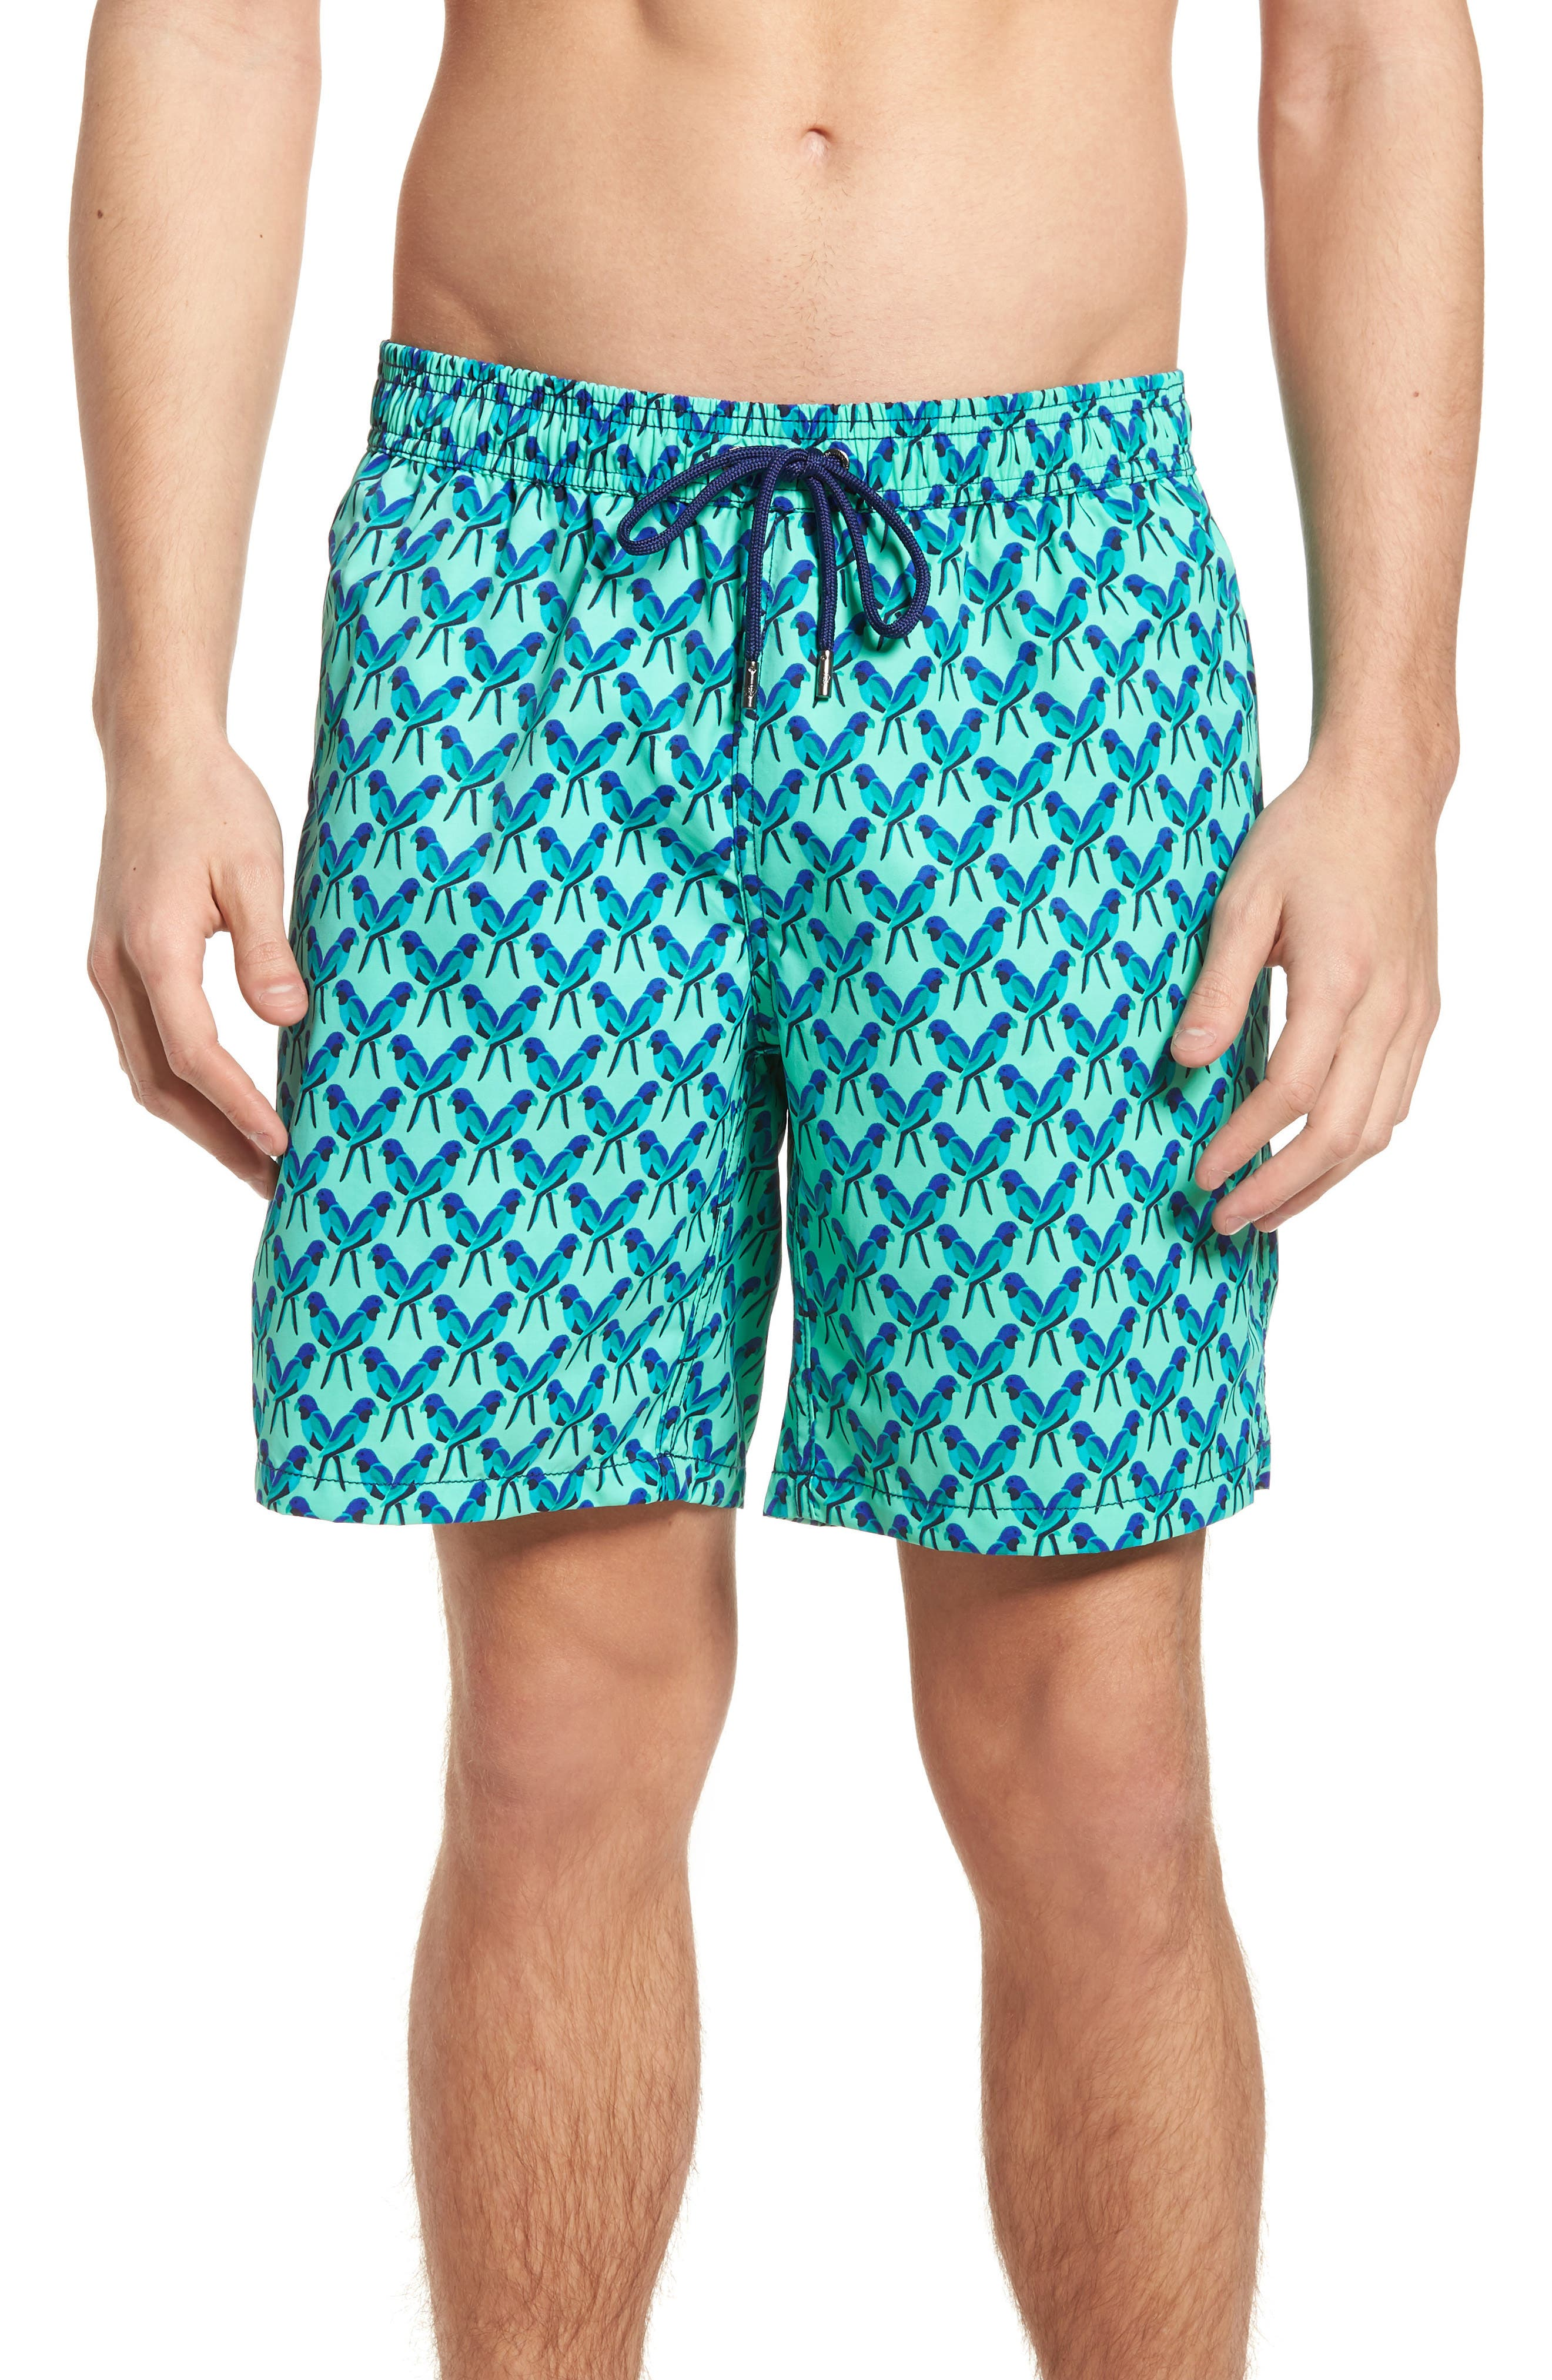 Mr. Swim Trim Fit Print Swim Trunks,                         Main,                         color, Teal